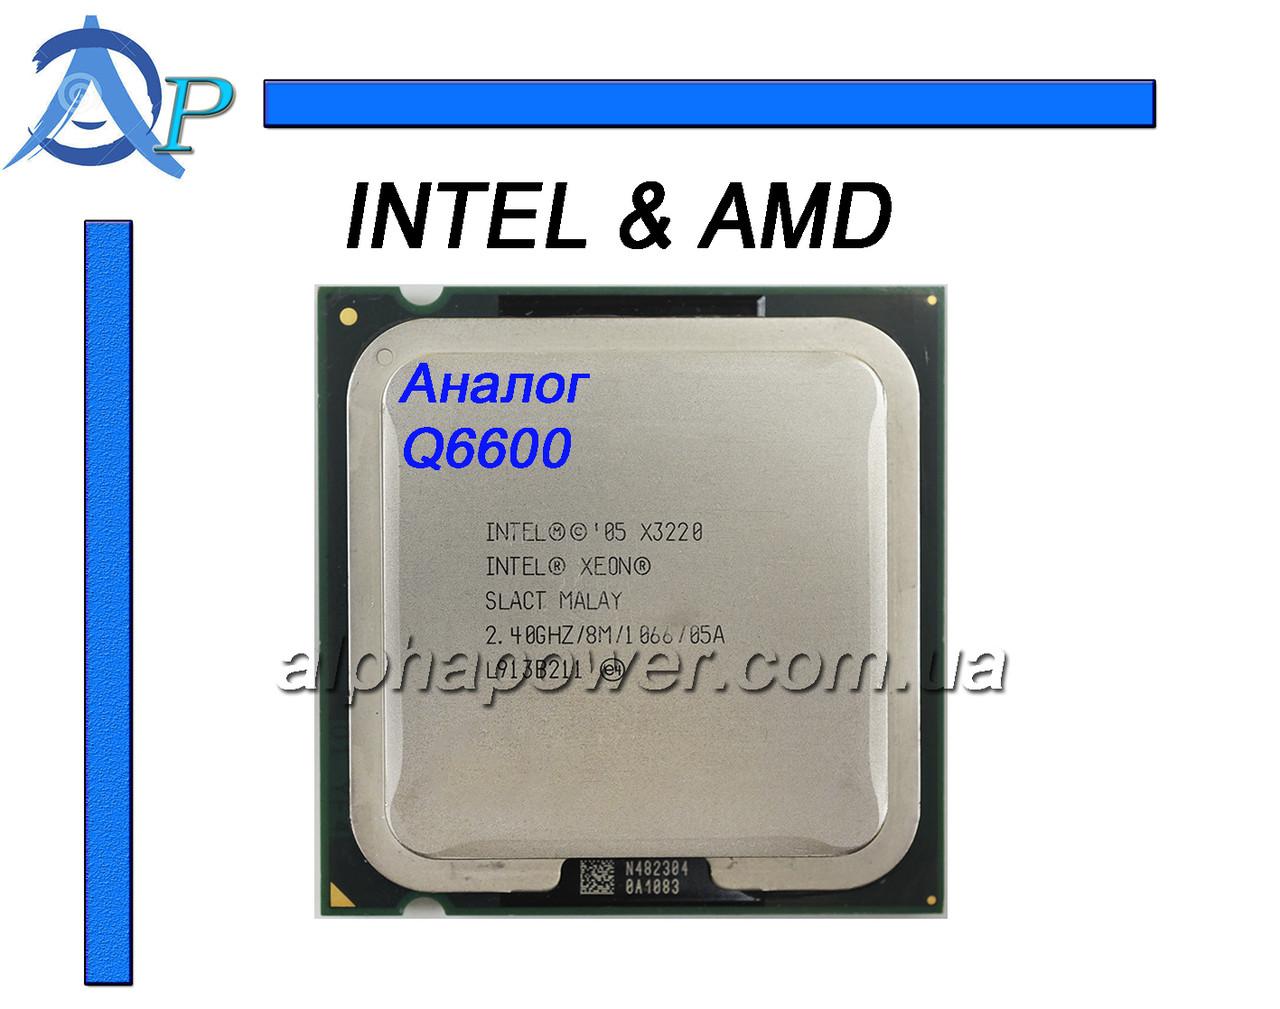 Q6600 Intel Core 2 Quad X3220 24ghz 1066mhz 8mb Socket 775